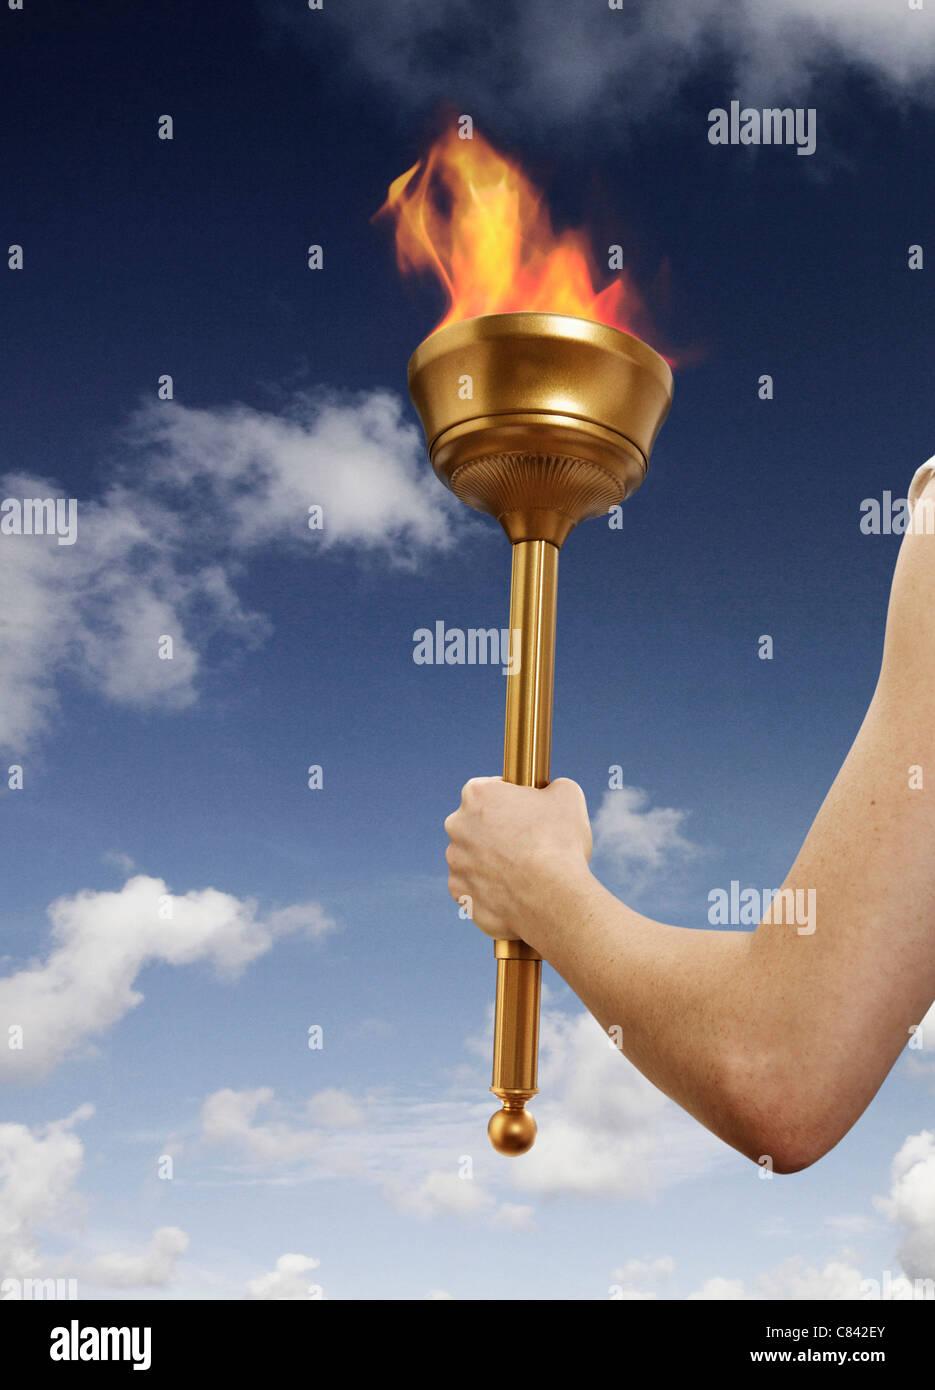 Hand holding flaming baton - Stock Image